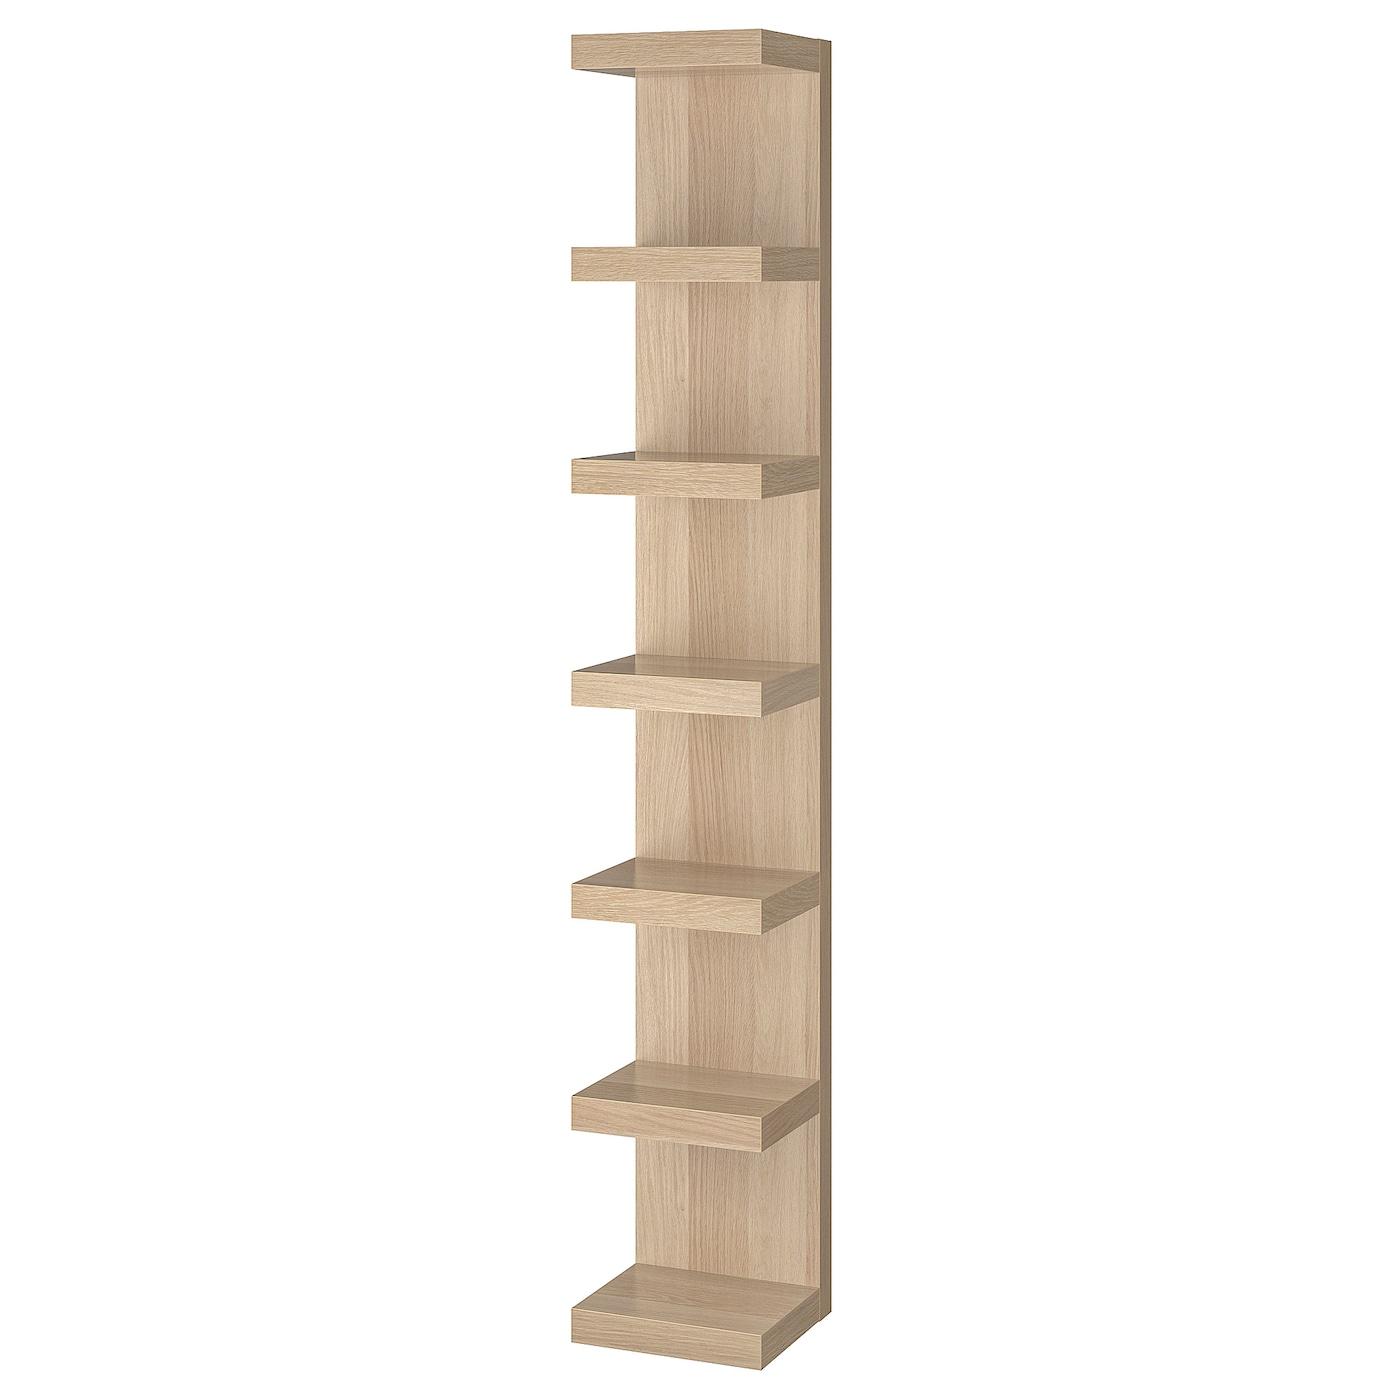 Lack Wall Shelf Unit White Stained Oak Effect